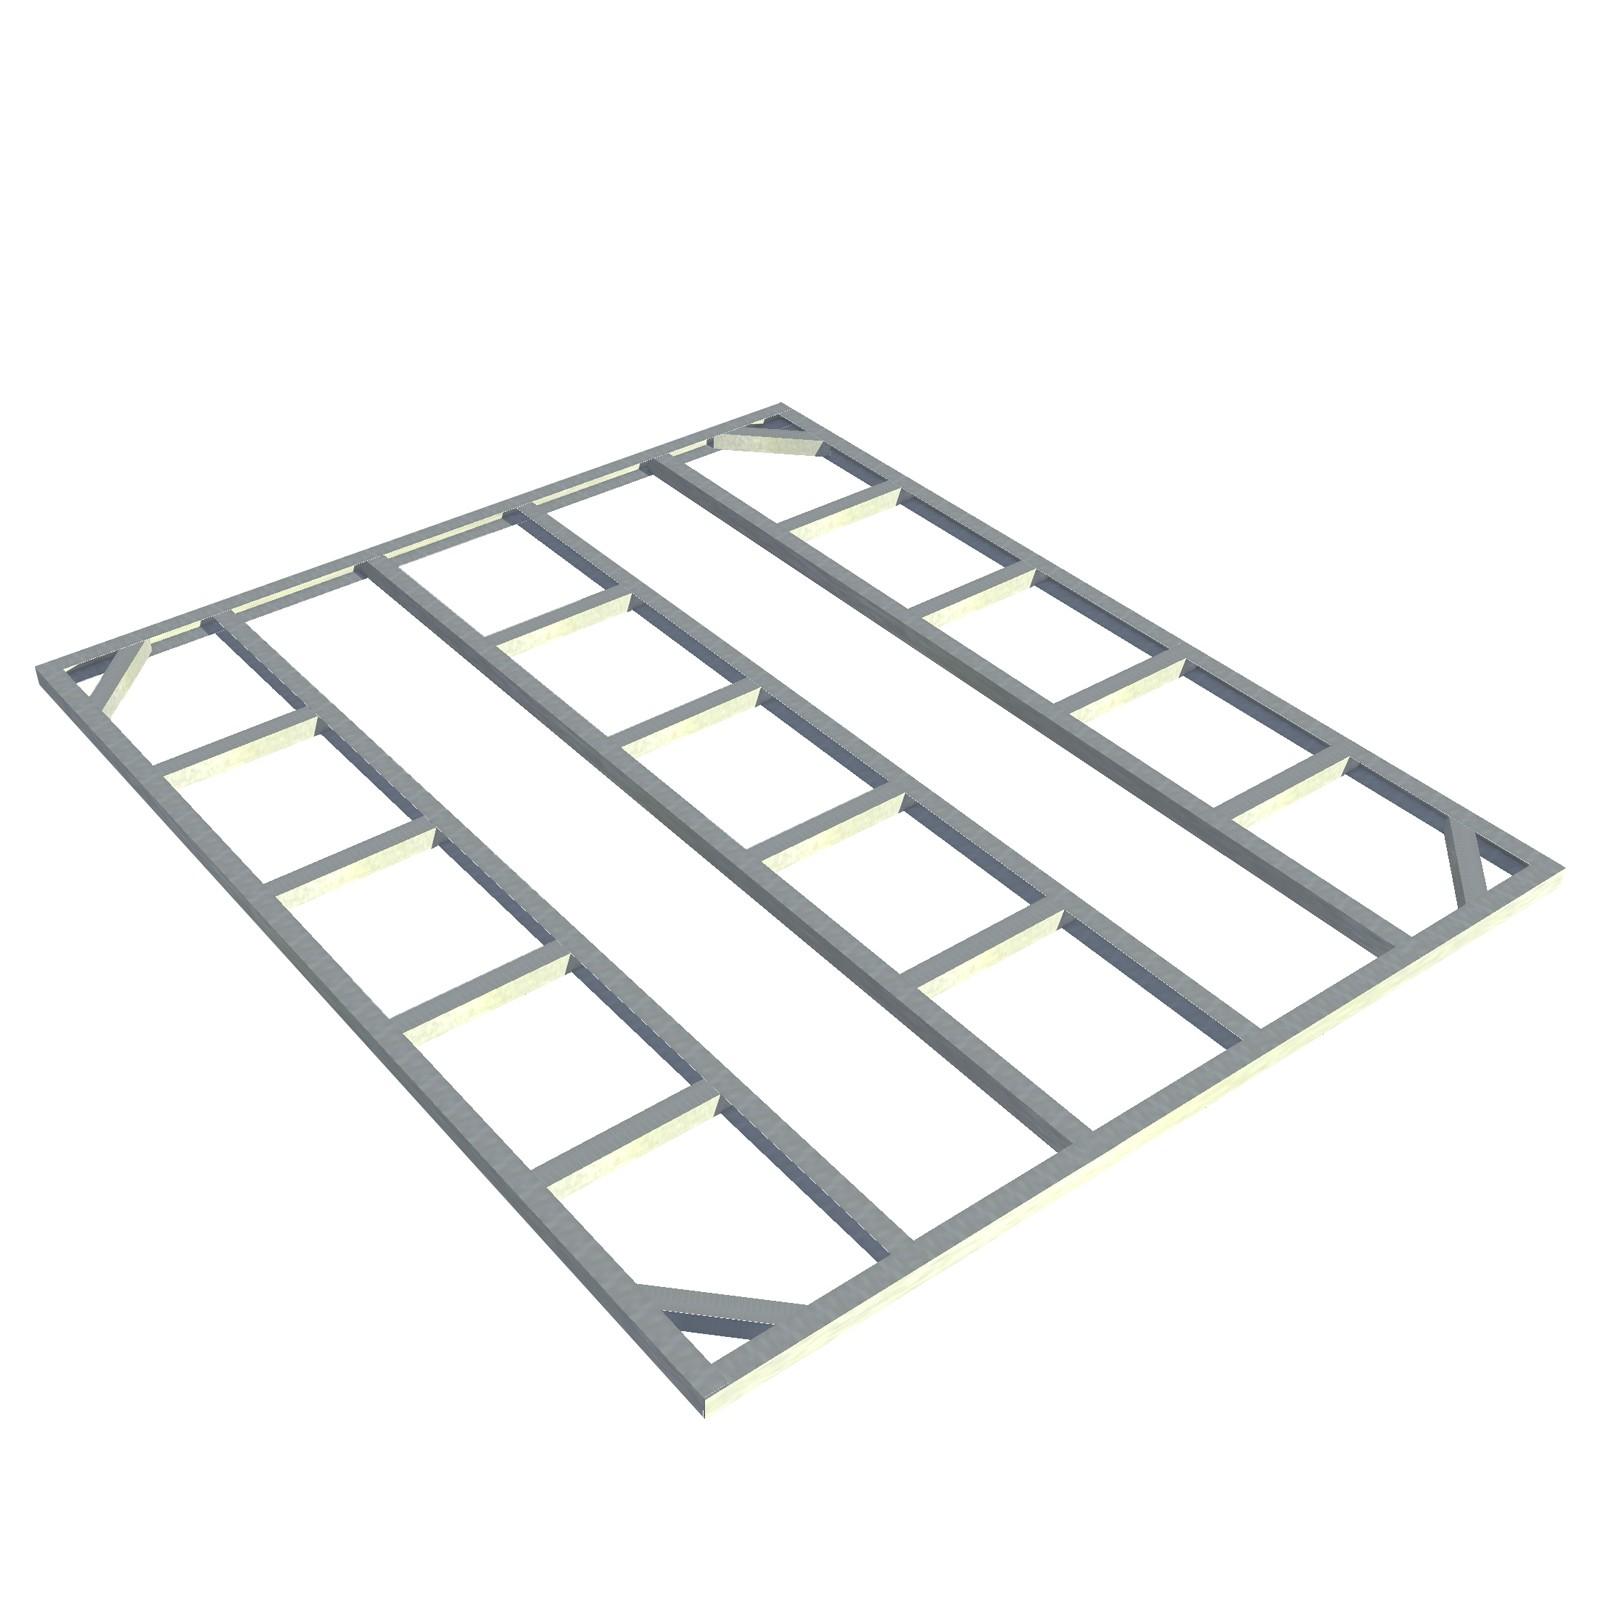 tepro metall unterkonstruktion fundament f r gartenhaus ger tehaus titan 8x6 ebay. Black Bedroom Furniture Sets. Home Design Ideas